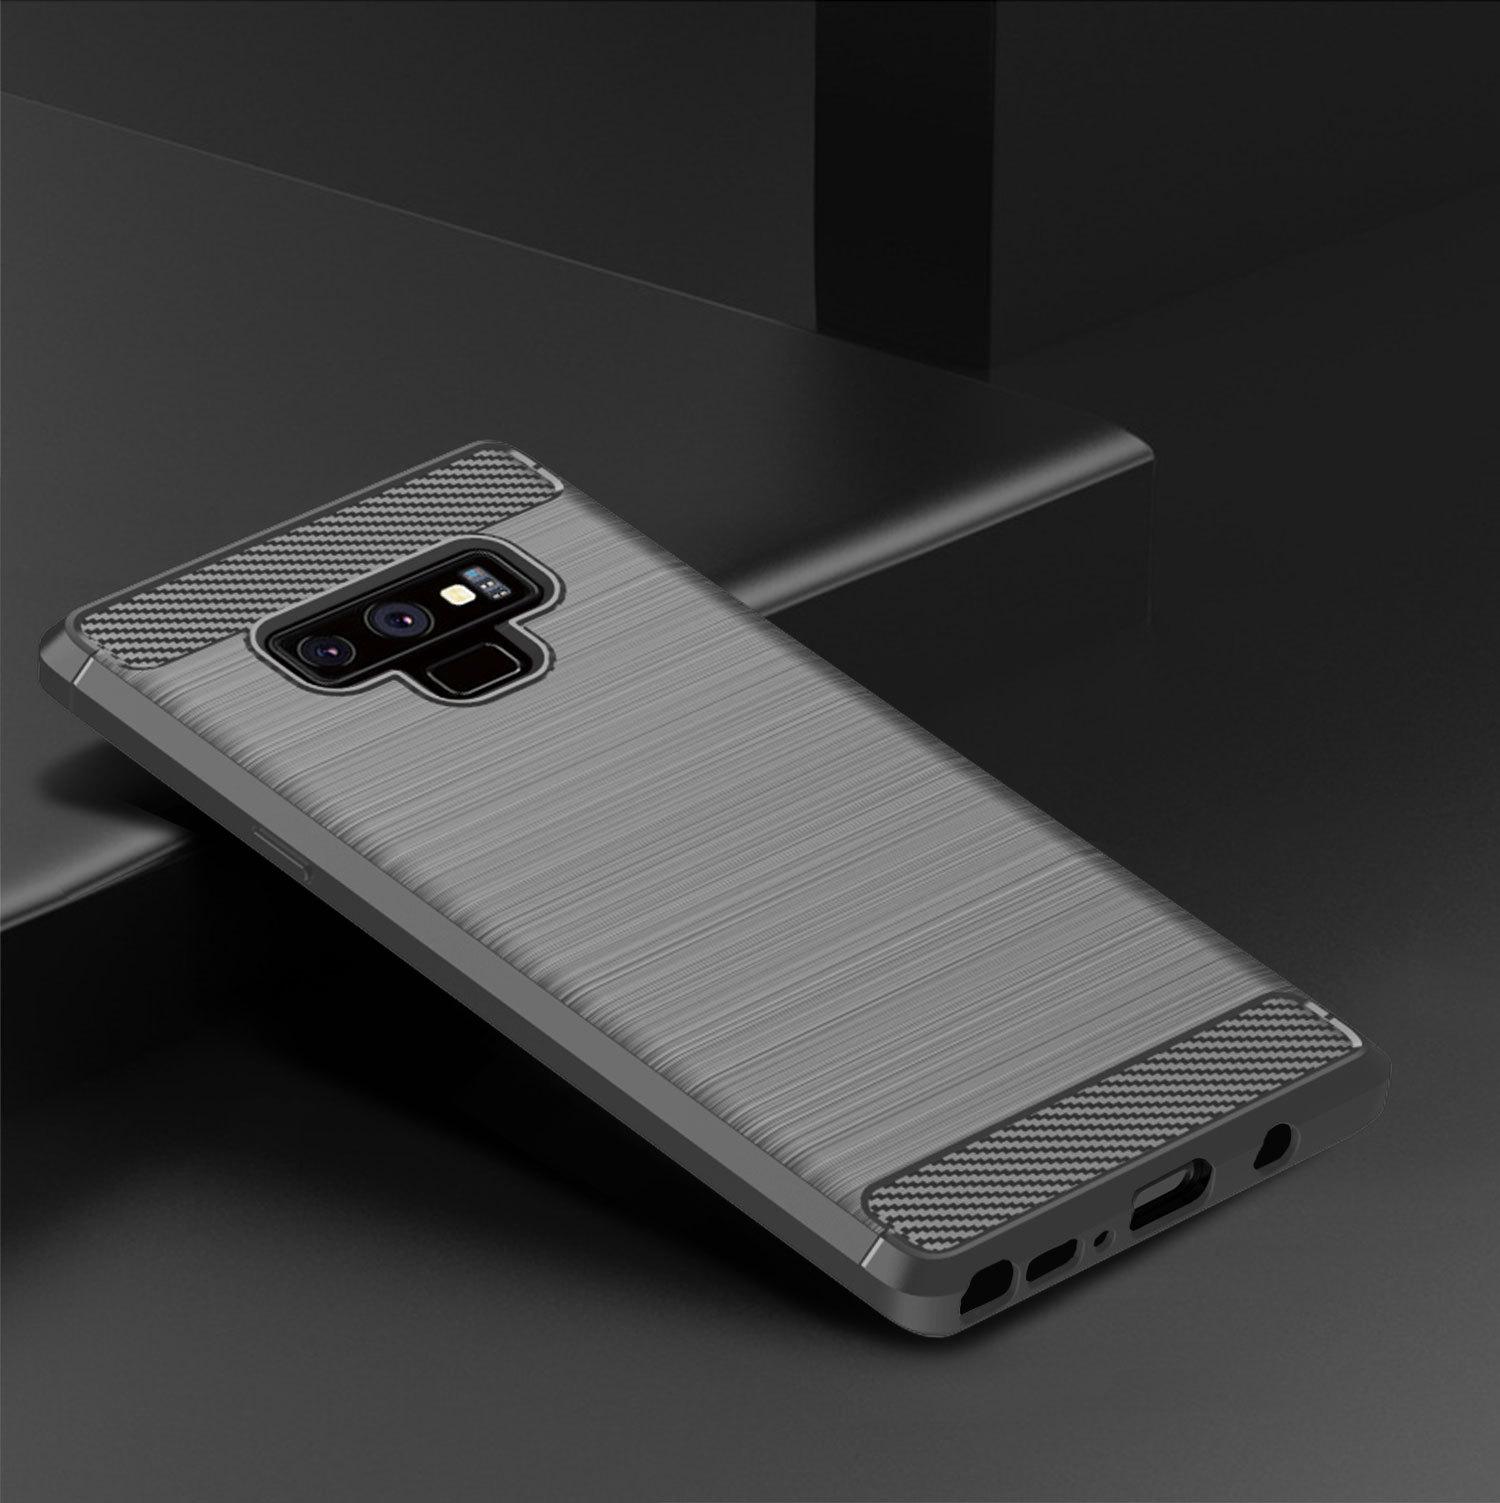 Чехол для Samsung Galaxy Note 9 цвет Gray (серый), серия Carbon от Caseport